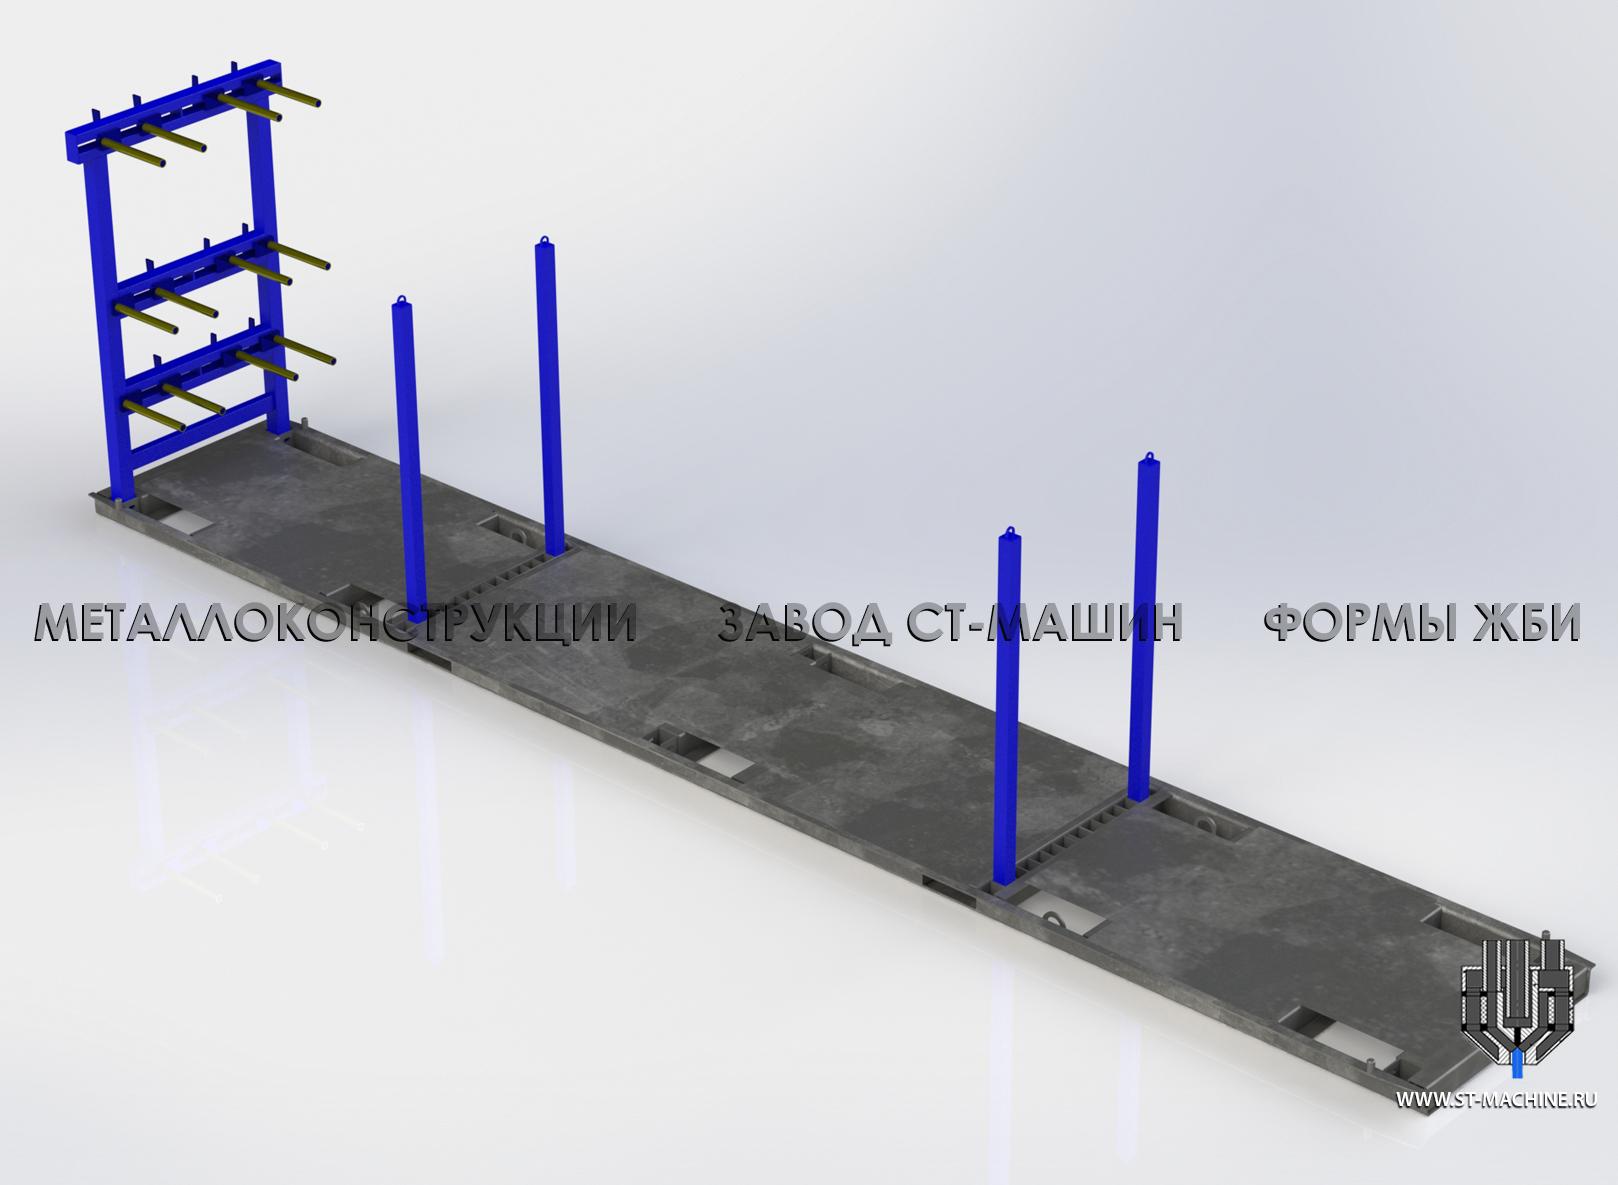 st-machine.ru-metallokonstrukcii-zakaz-palletu.jpg